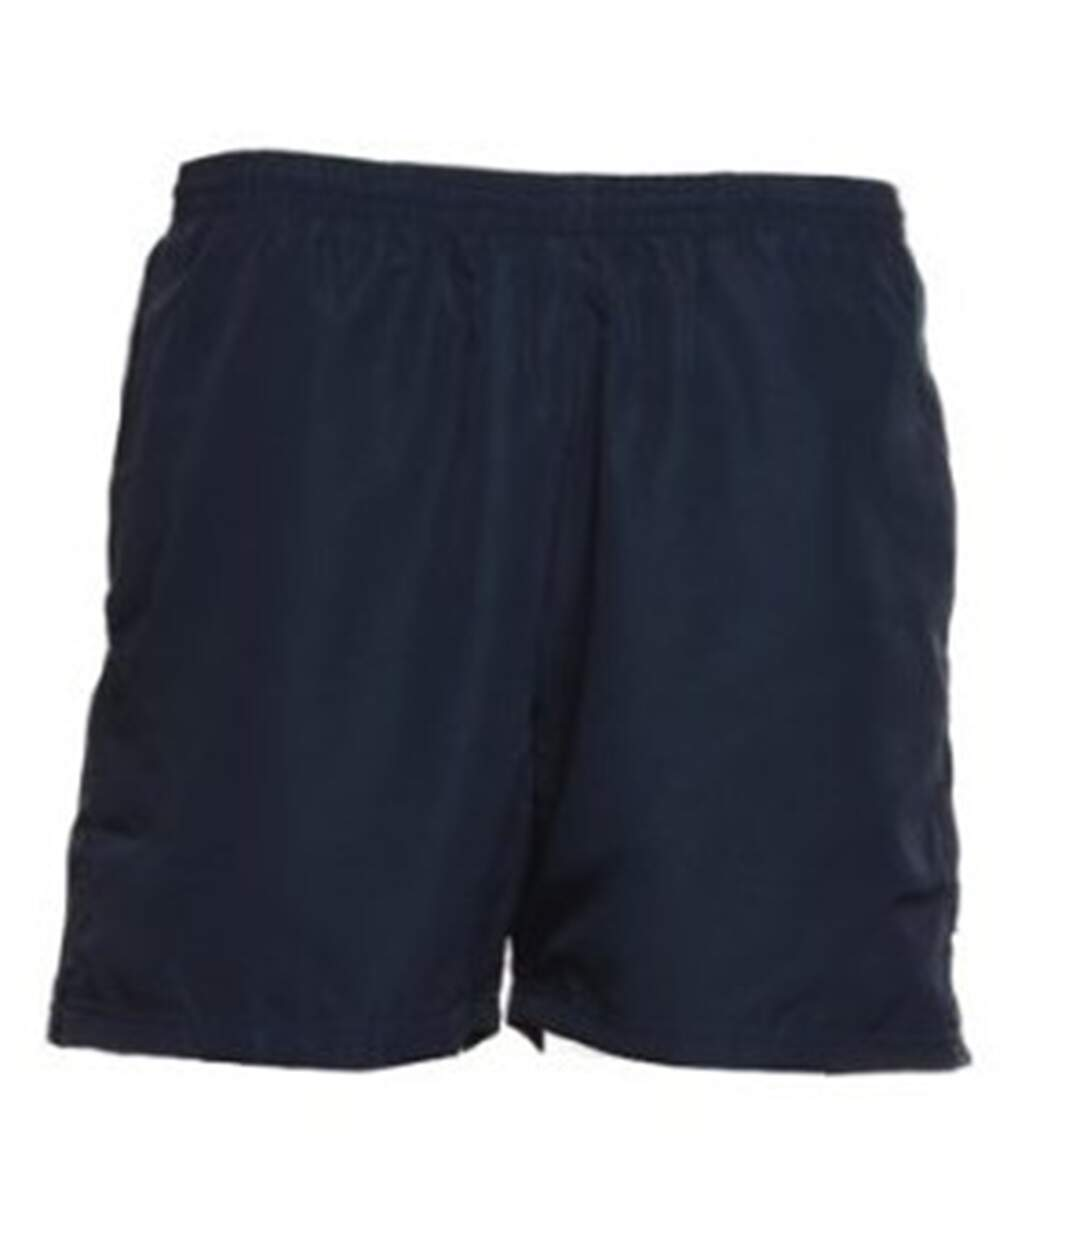 Gamegear® Mens Cooltex® Training Short / Mens Sportswear (Navy Blue) - UTBC447